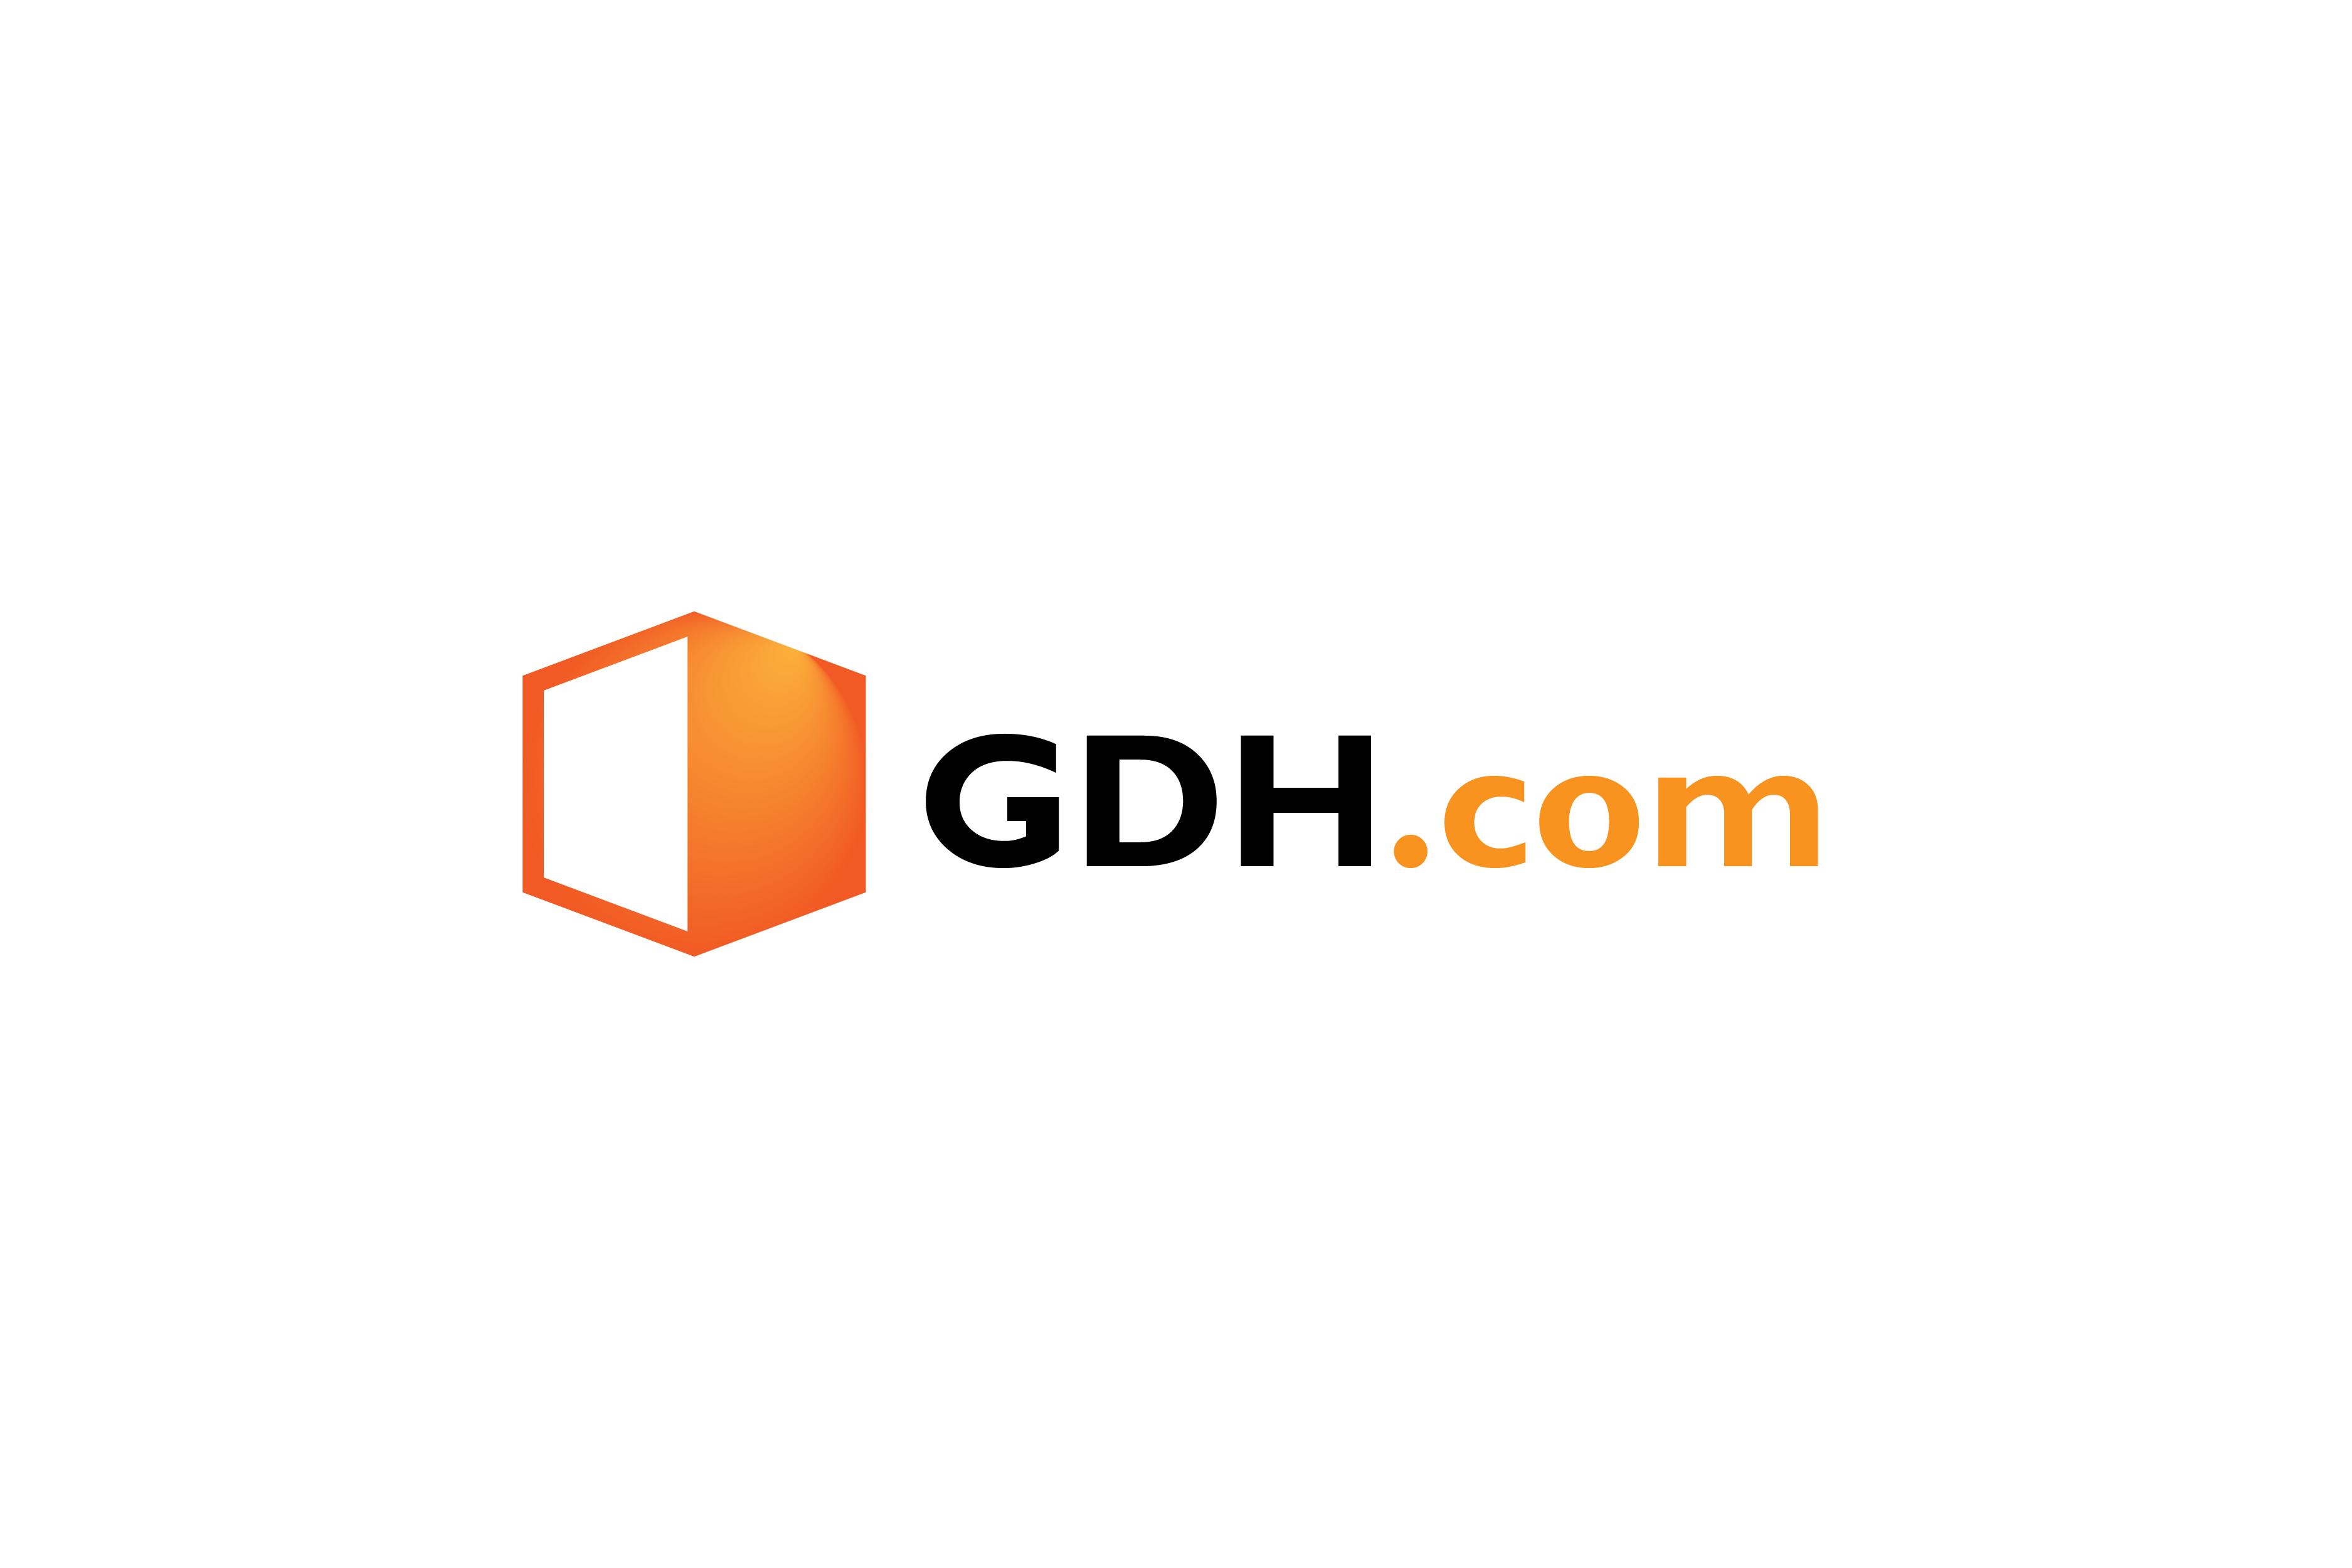 Logo design gdh graphic design home by raymondgd on deviantart - Homes logo designs ...